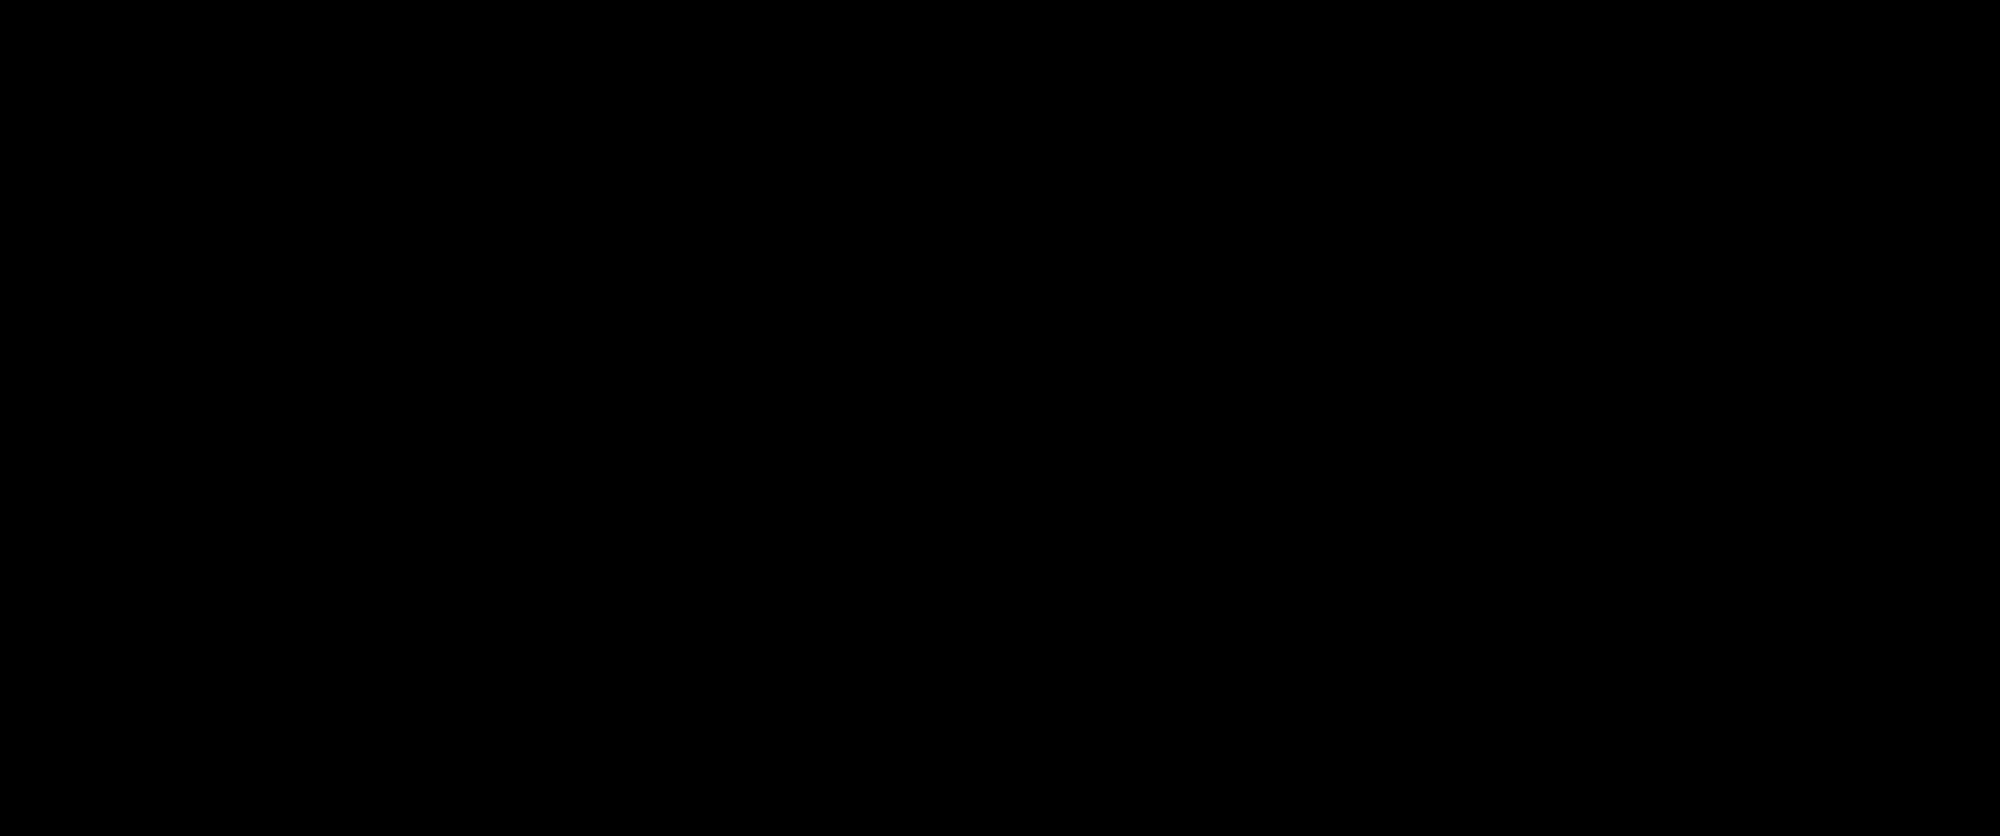 Copy of kamangir